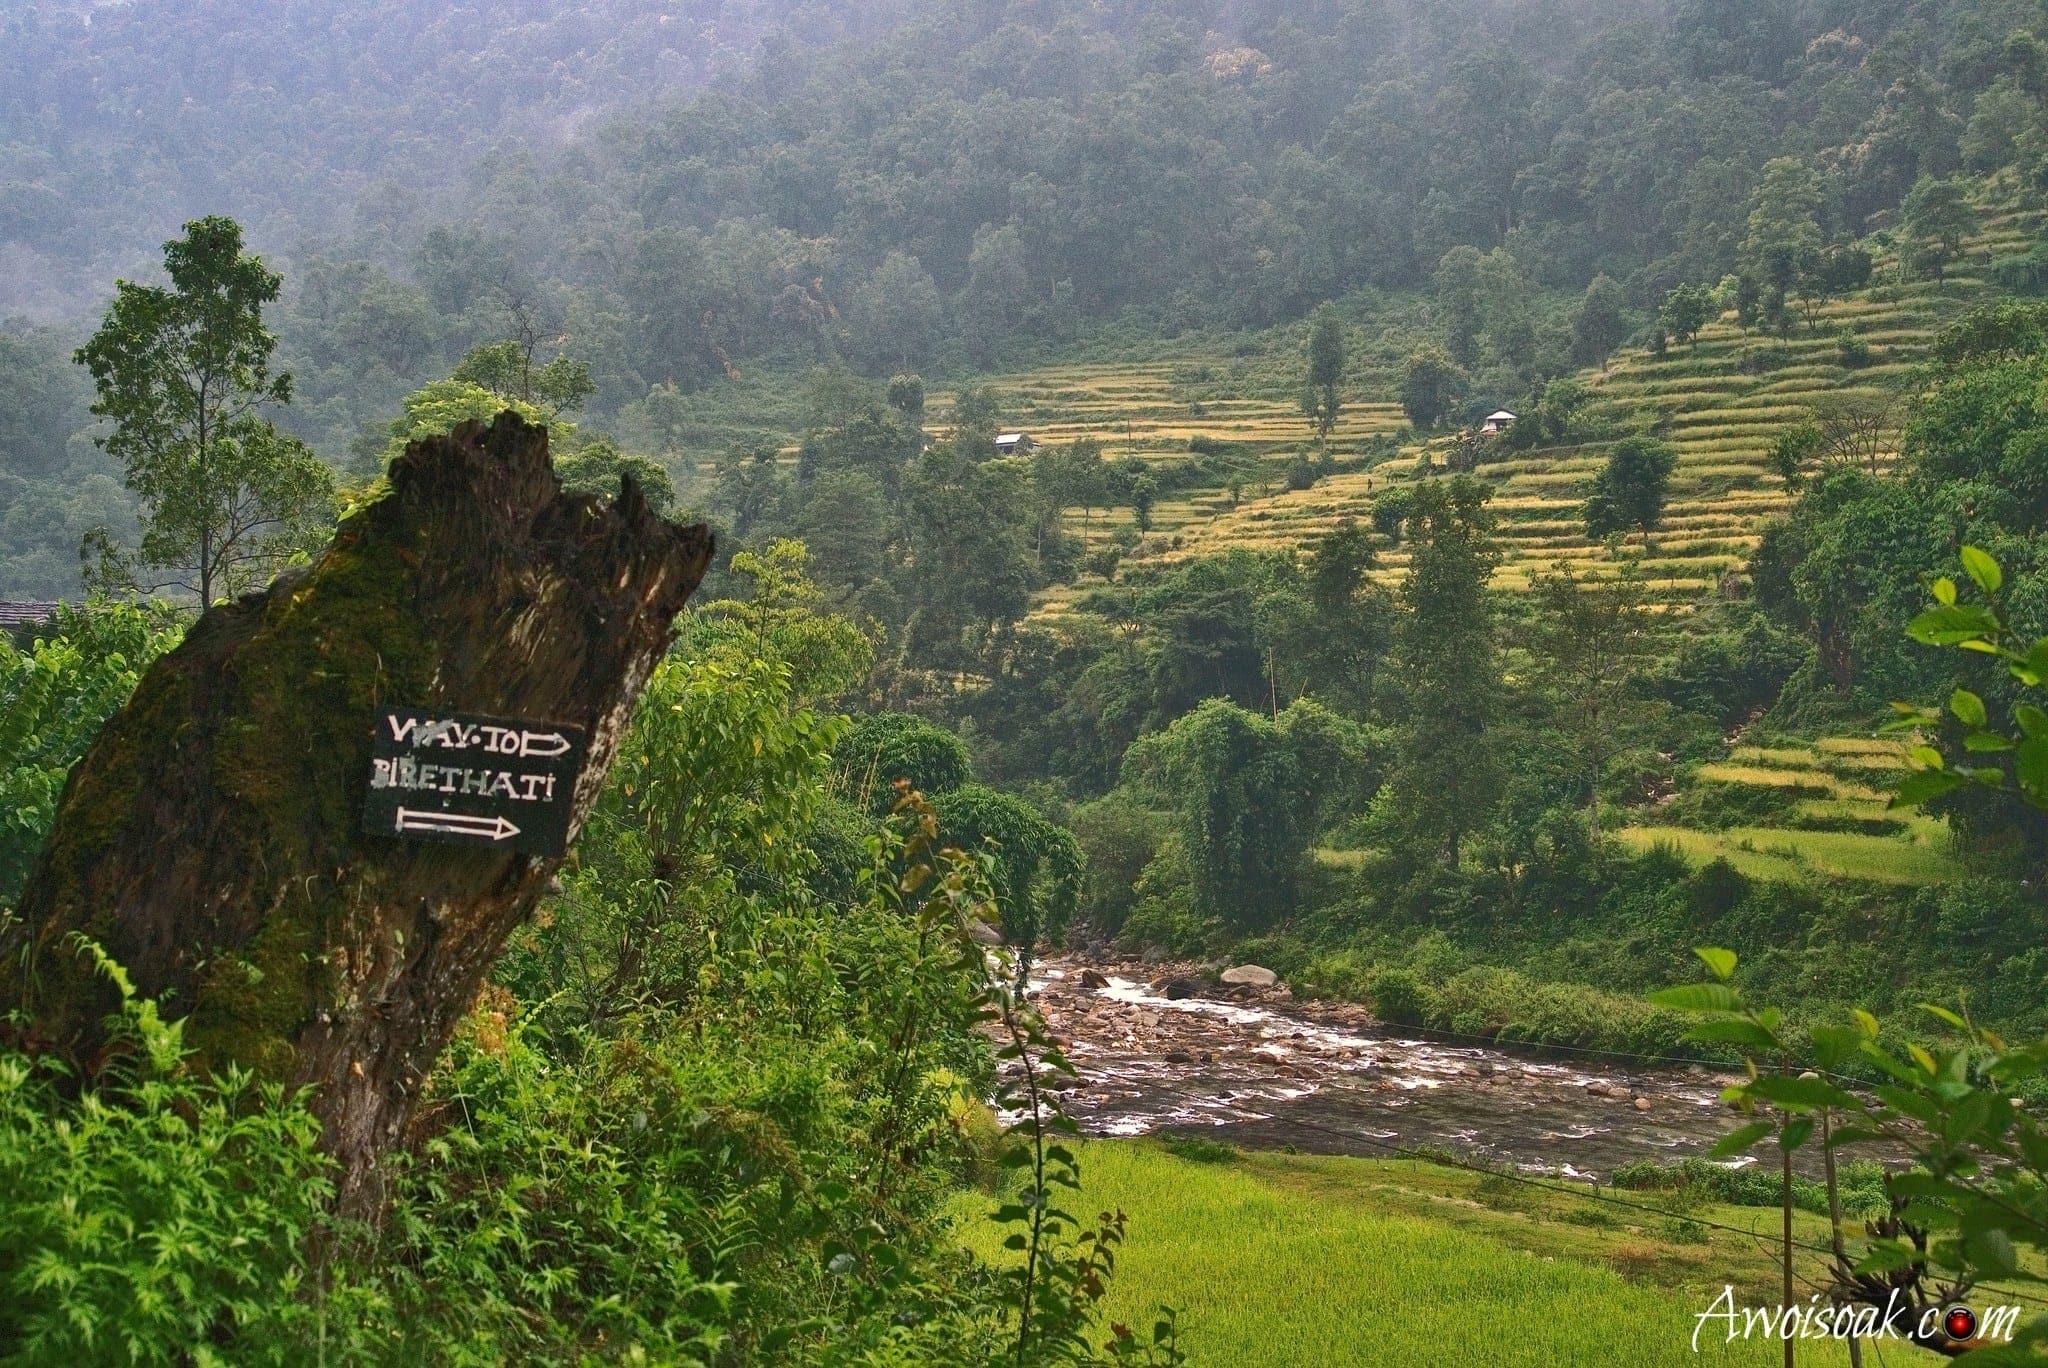 Ghorepani Poon Hill Trek | AwOiSoAk